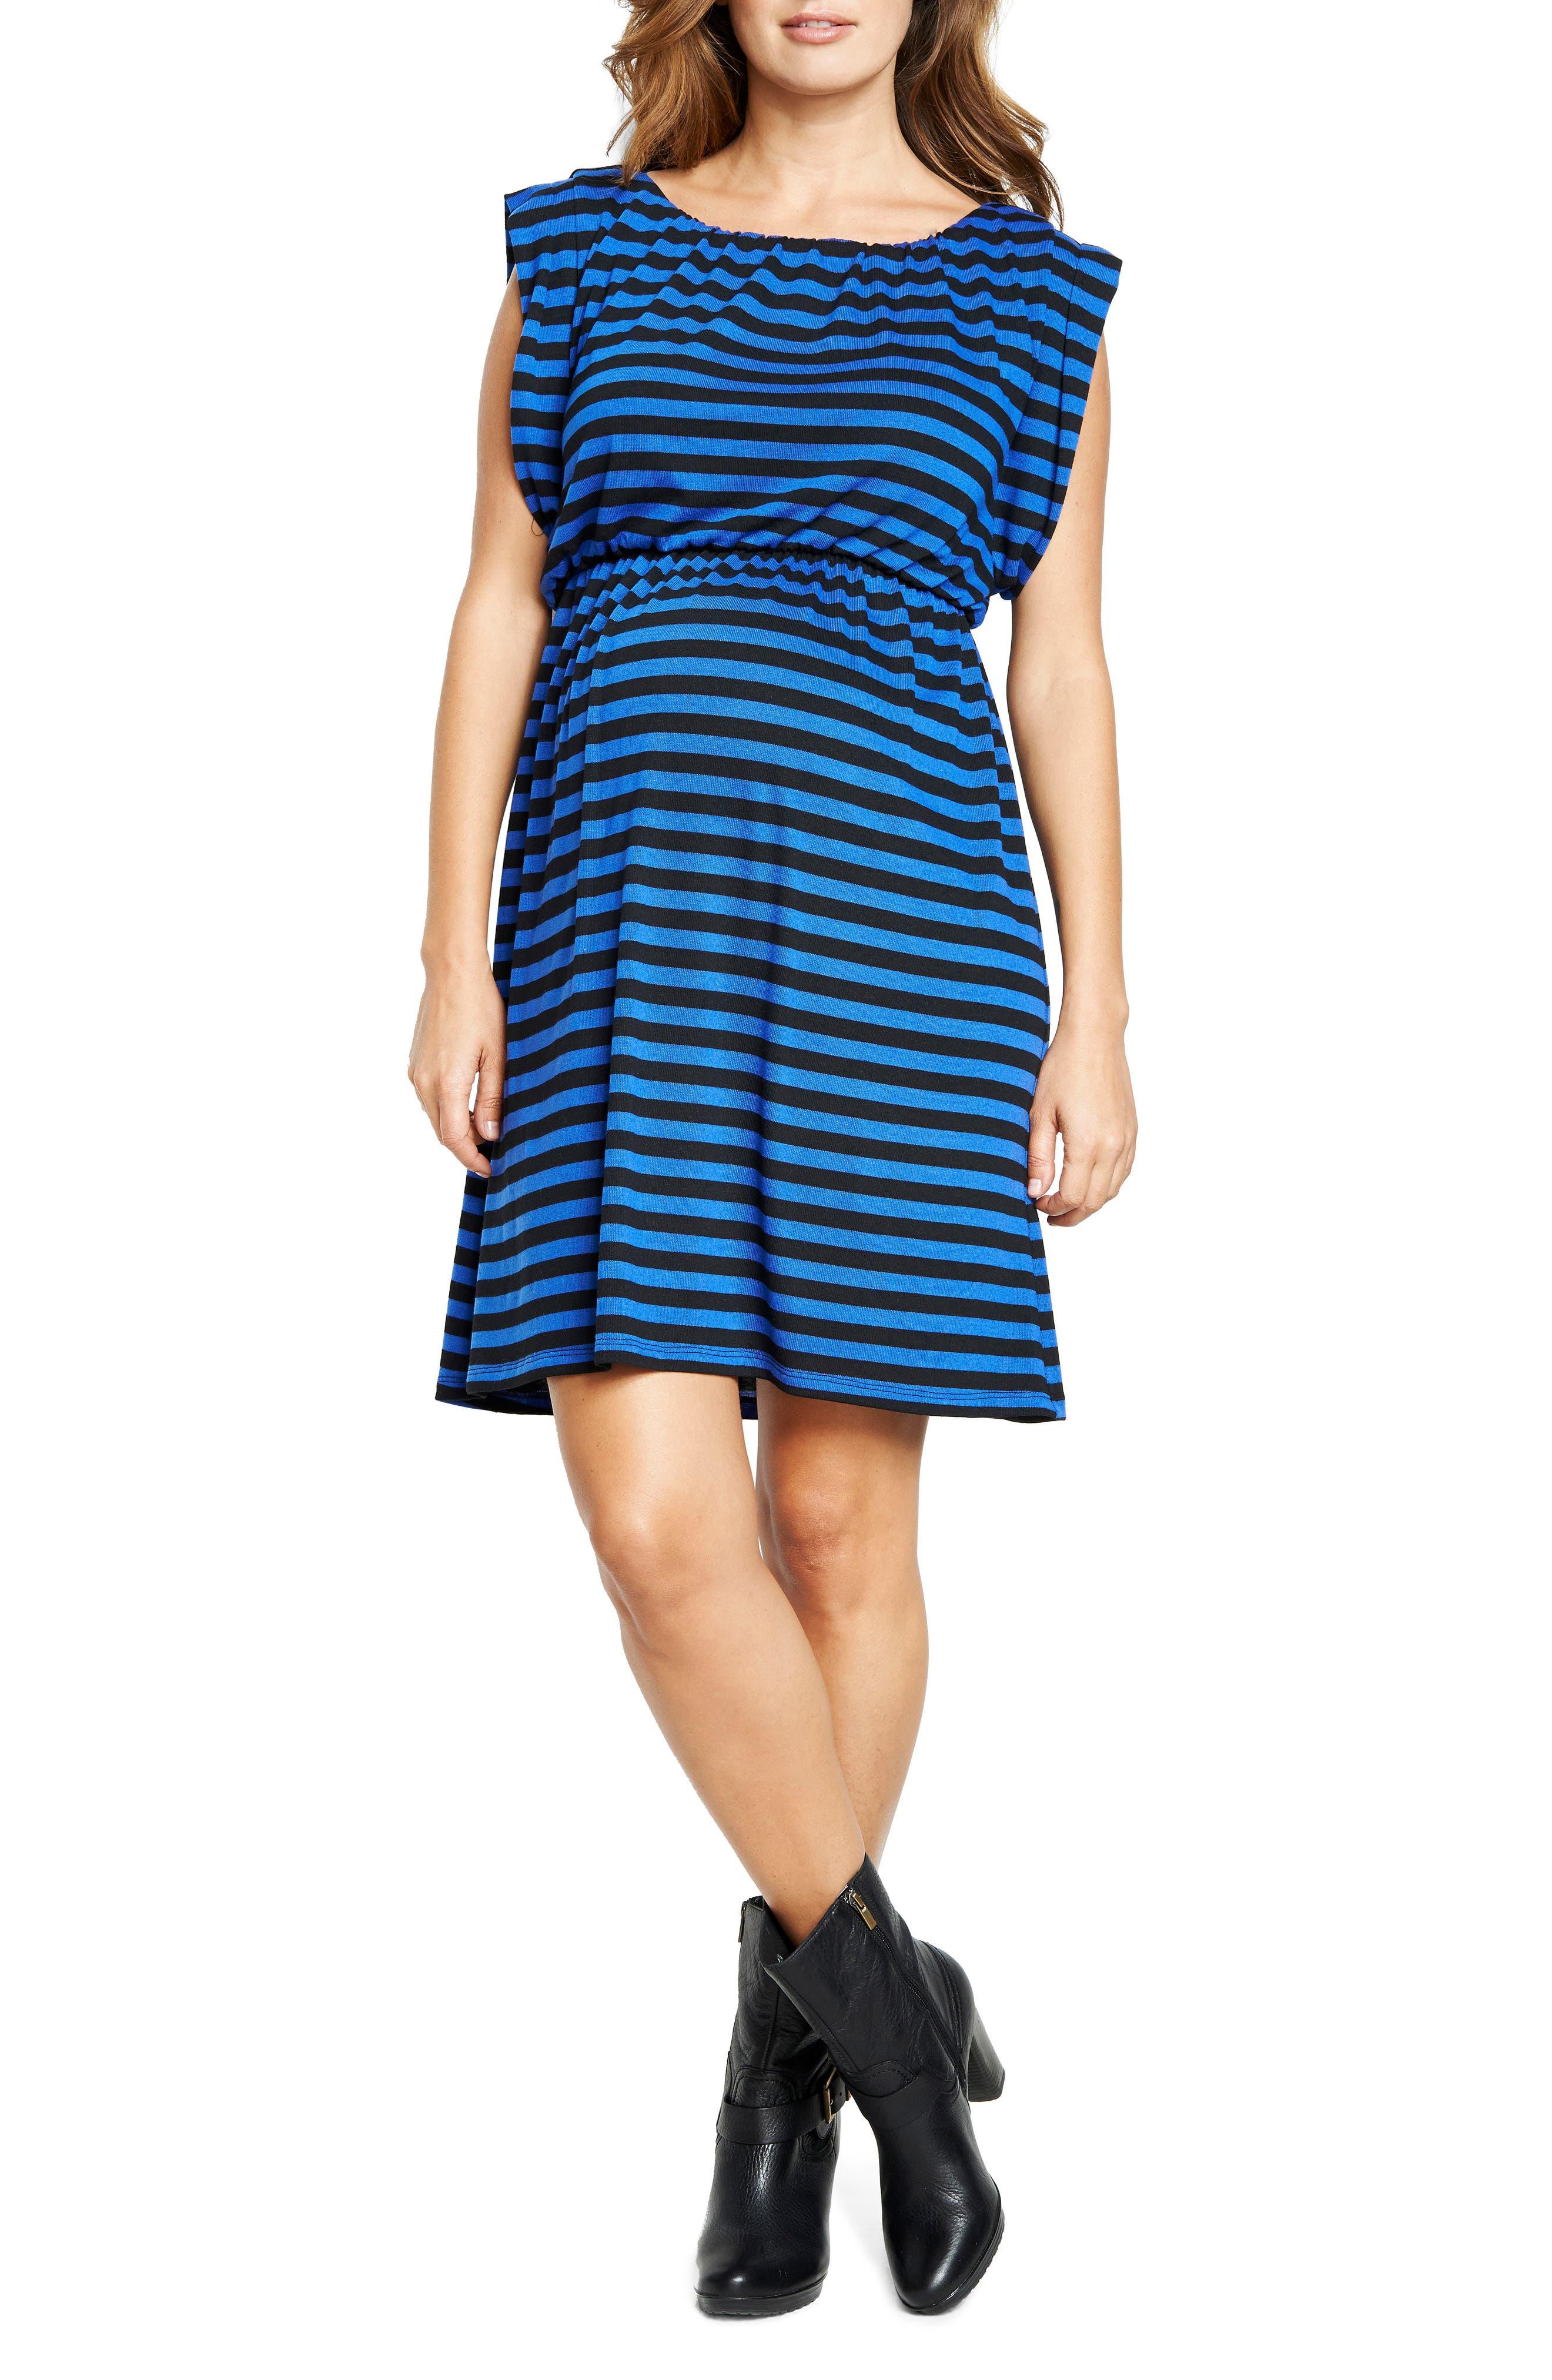 Maternal America Maternity Printed Tunic Dress, Blue